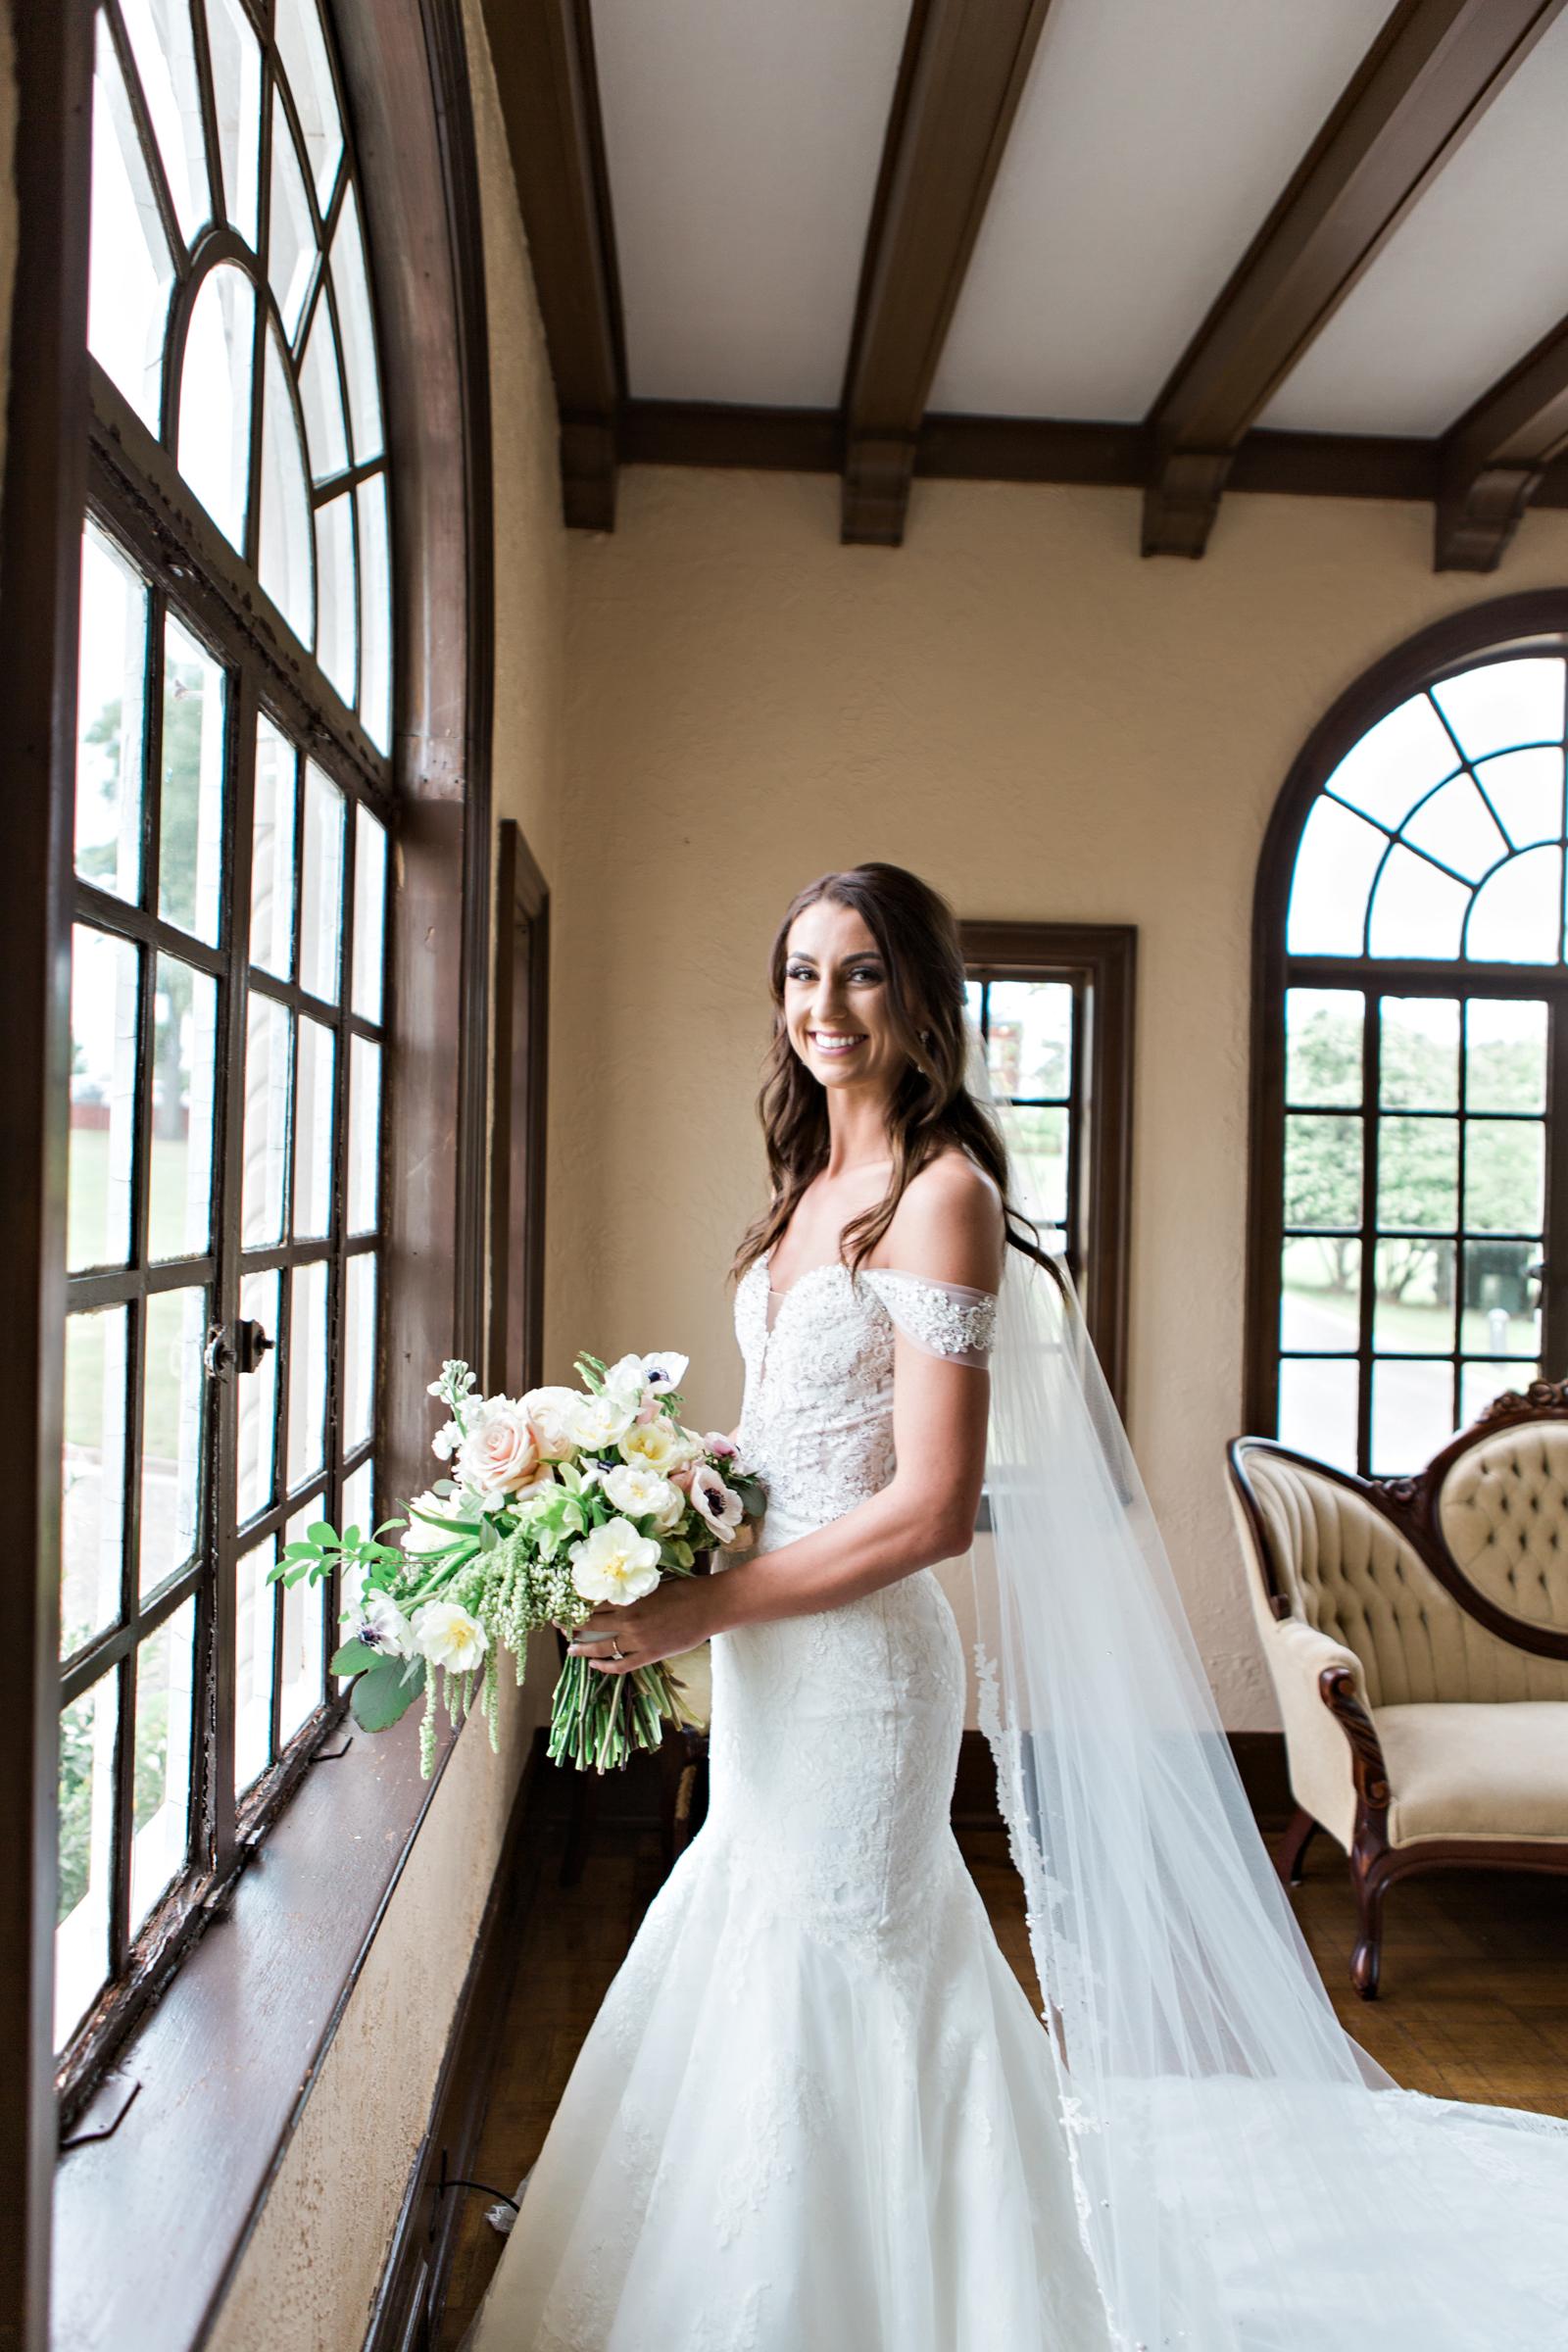 Matty-Drollette-Montgomery-Alabama-Wedding-Photography-108.jpg